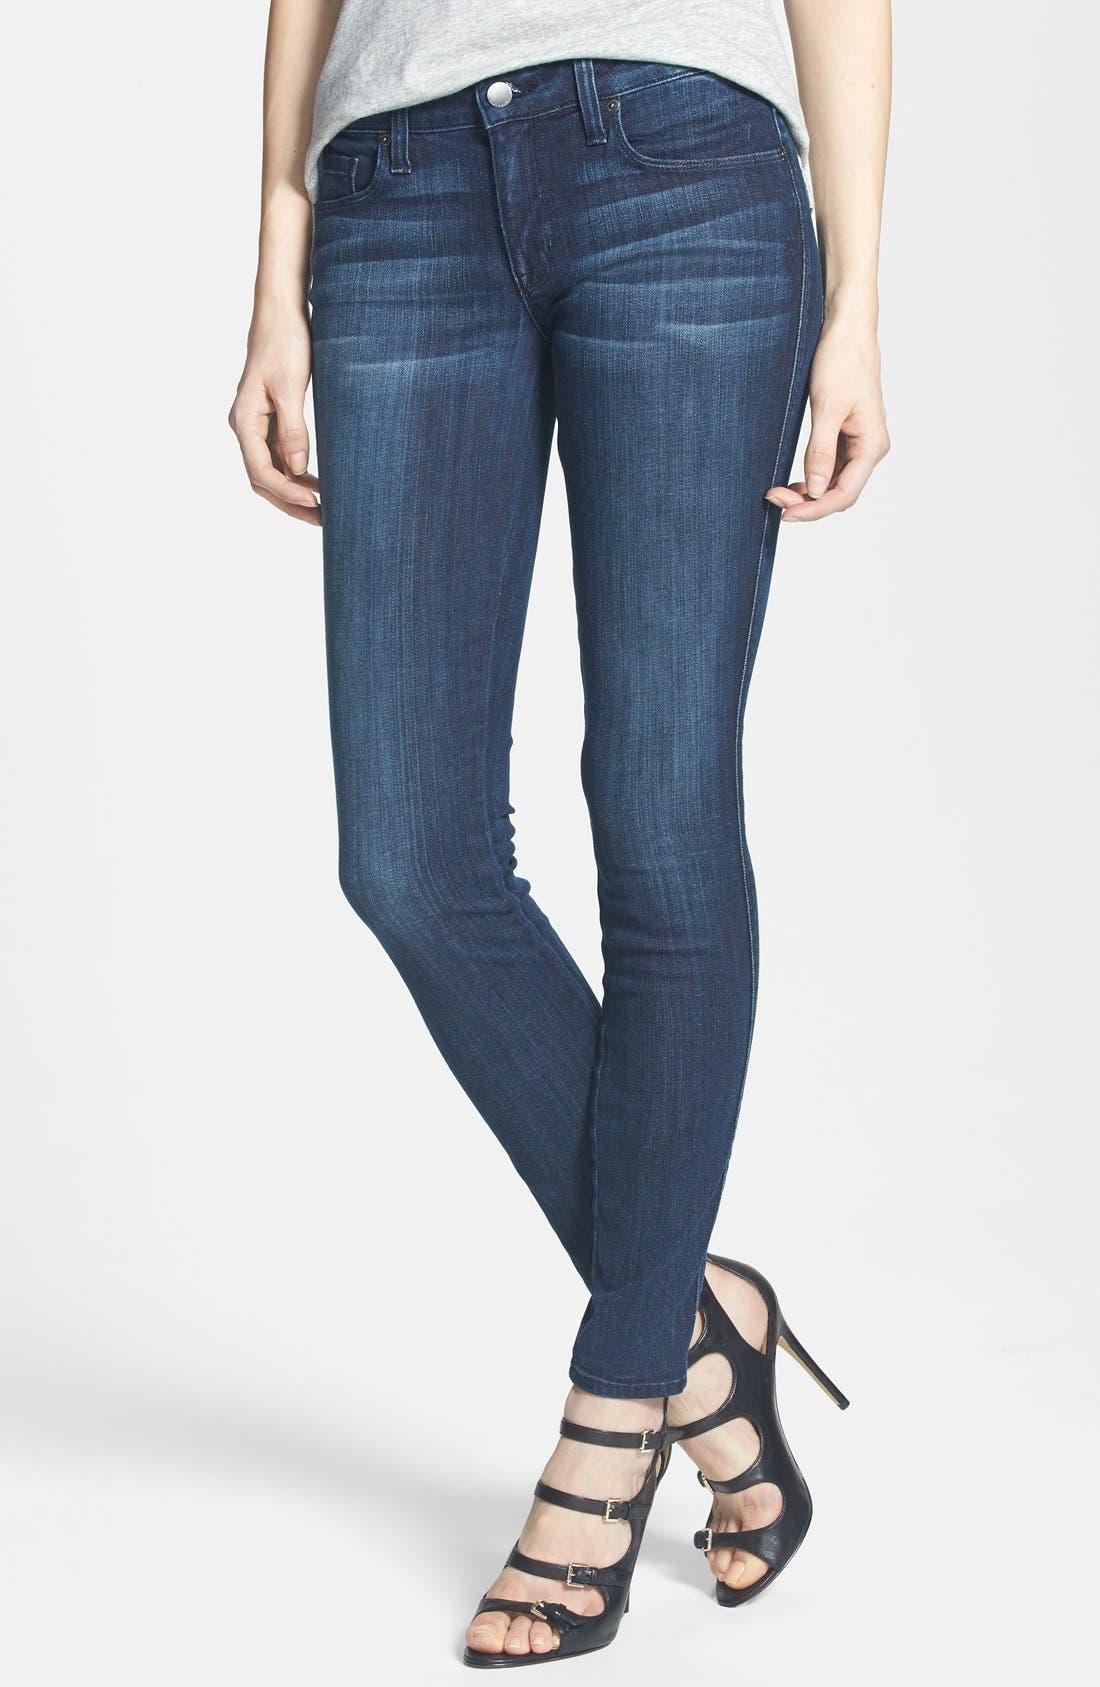 Alternate Image 1 Selected - Genetic 'Shya' Skinny Jeans (Hype)